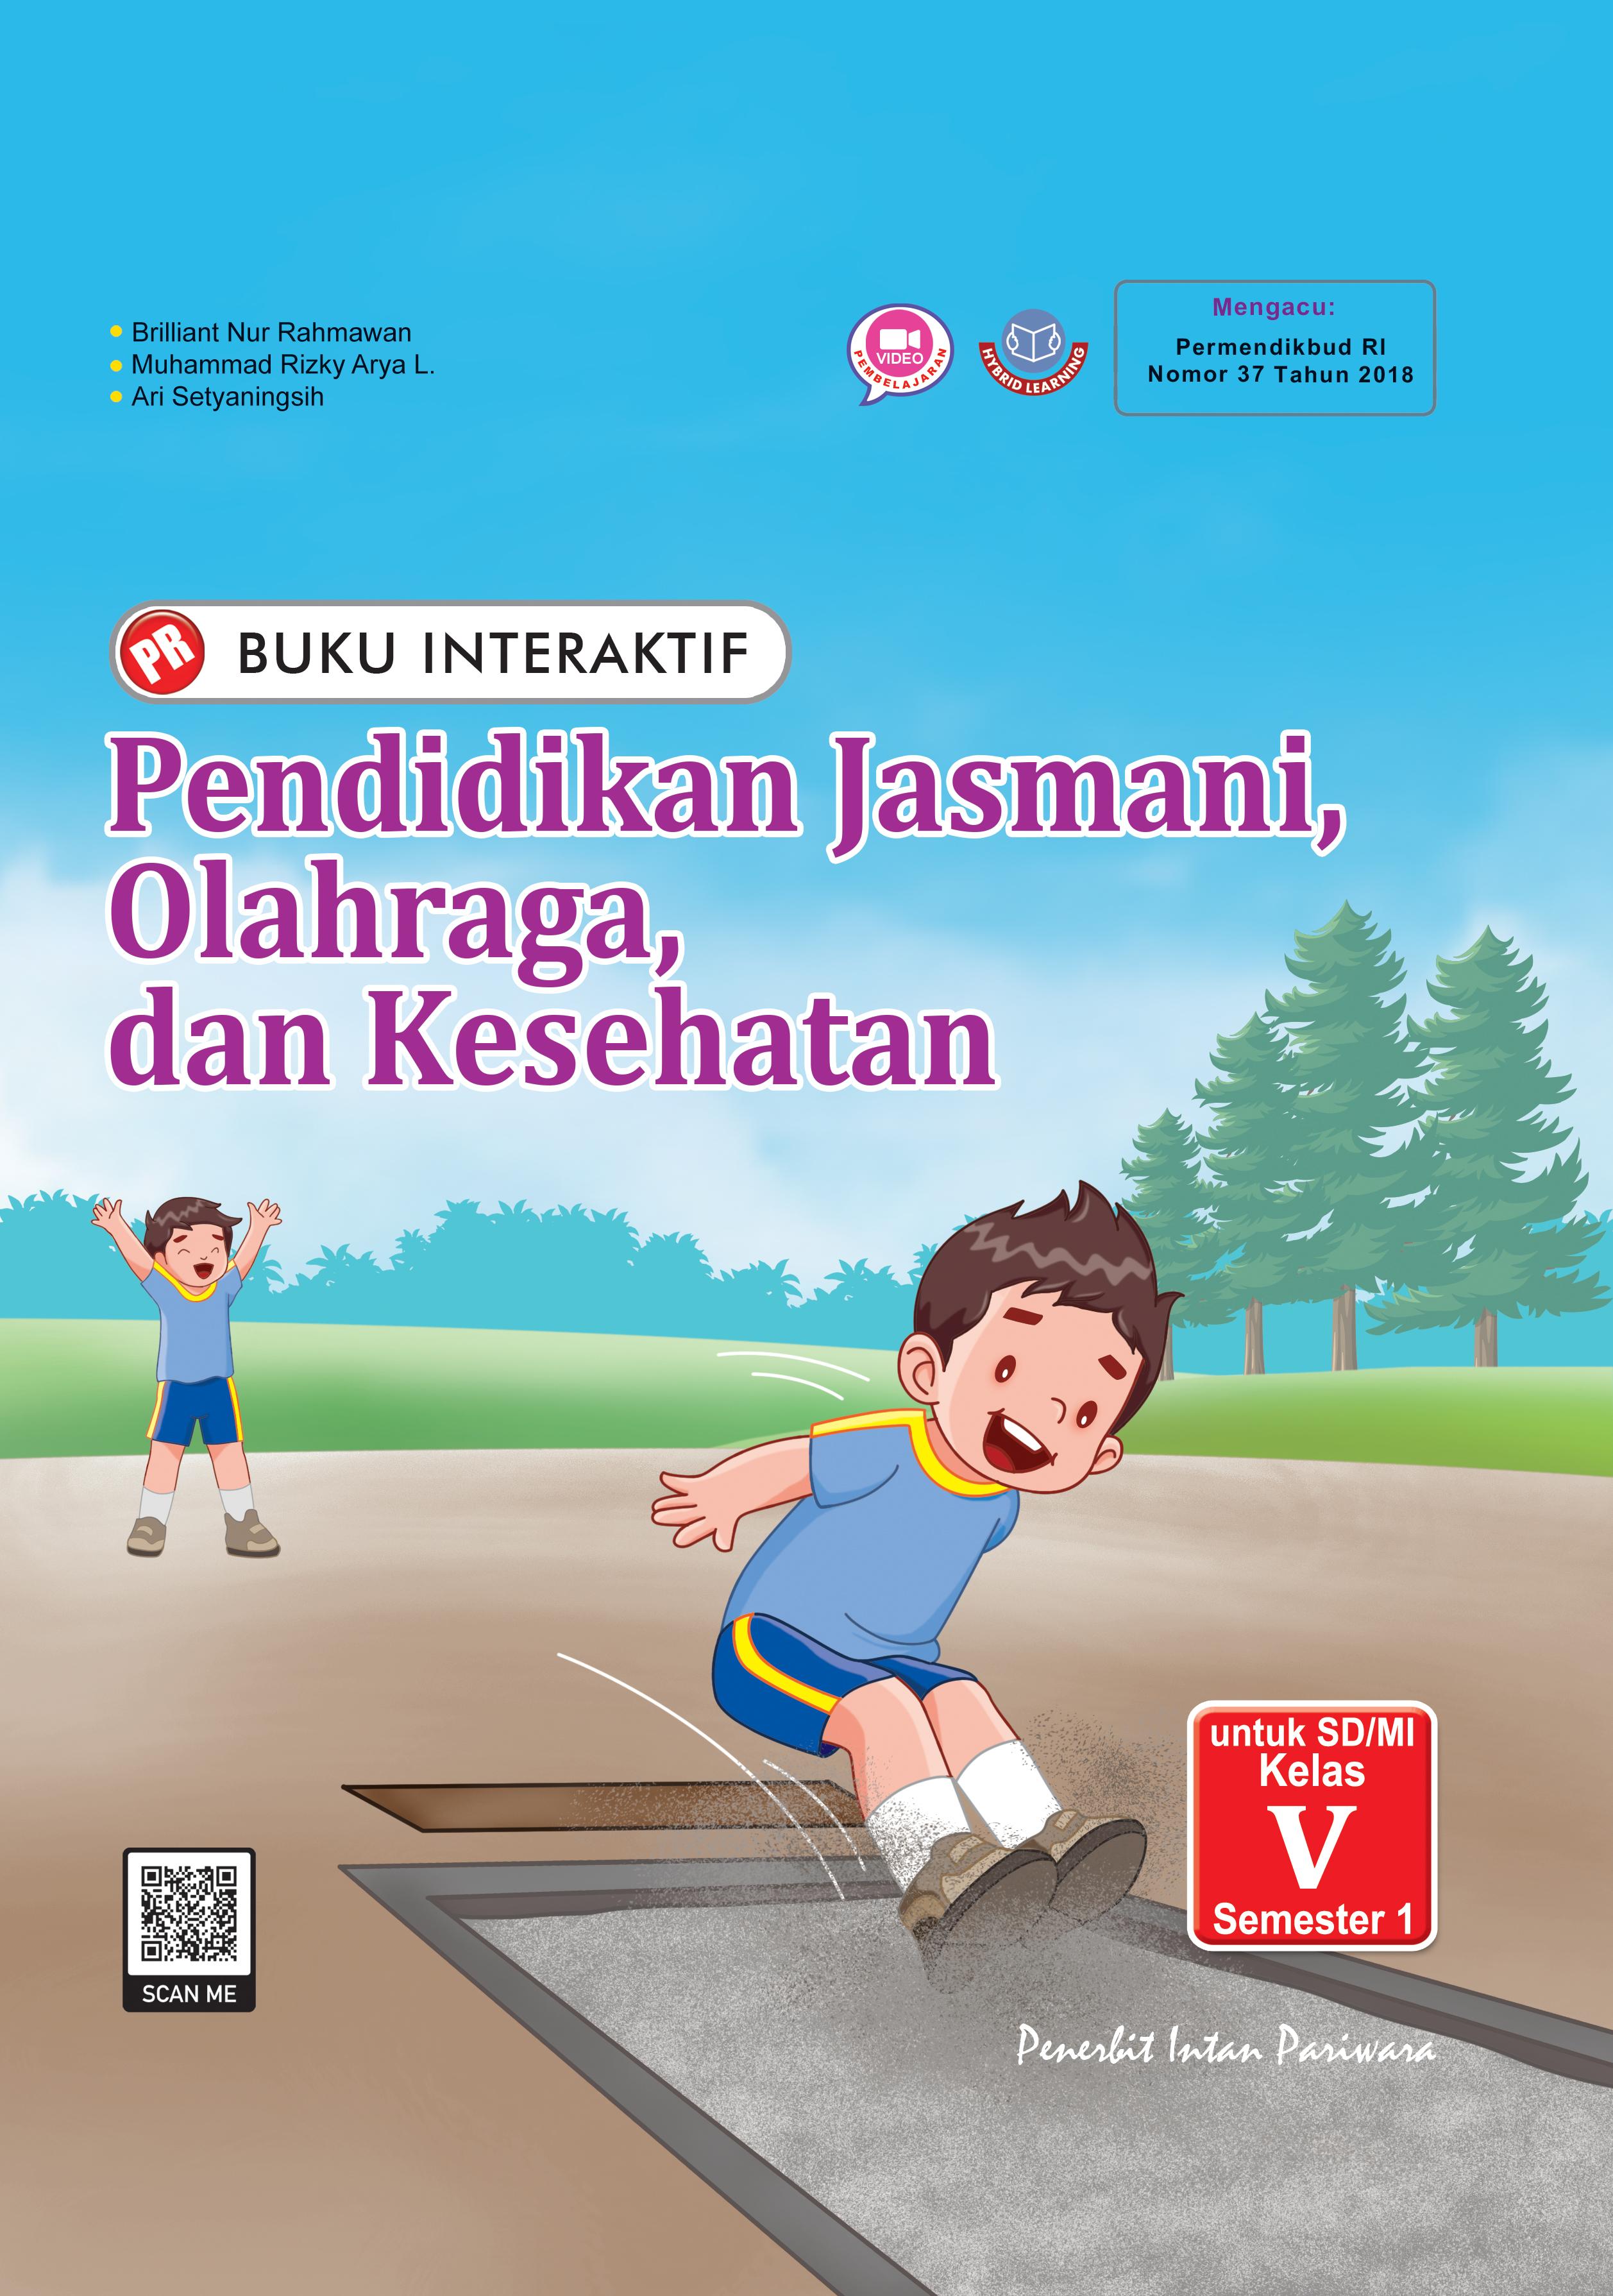 Buku Interaktif: Pendidikan Jasmani dan Olahraga V Semester 1